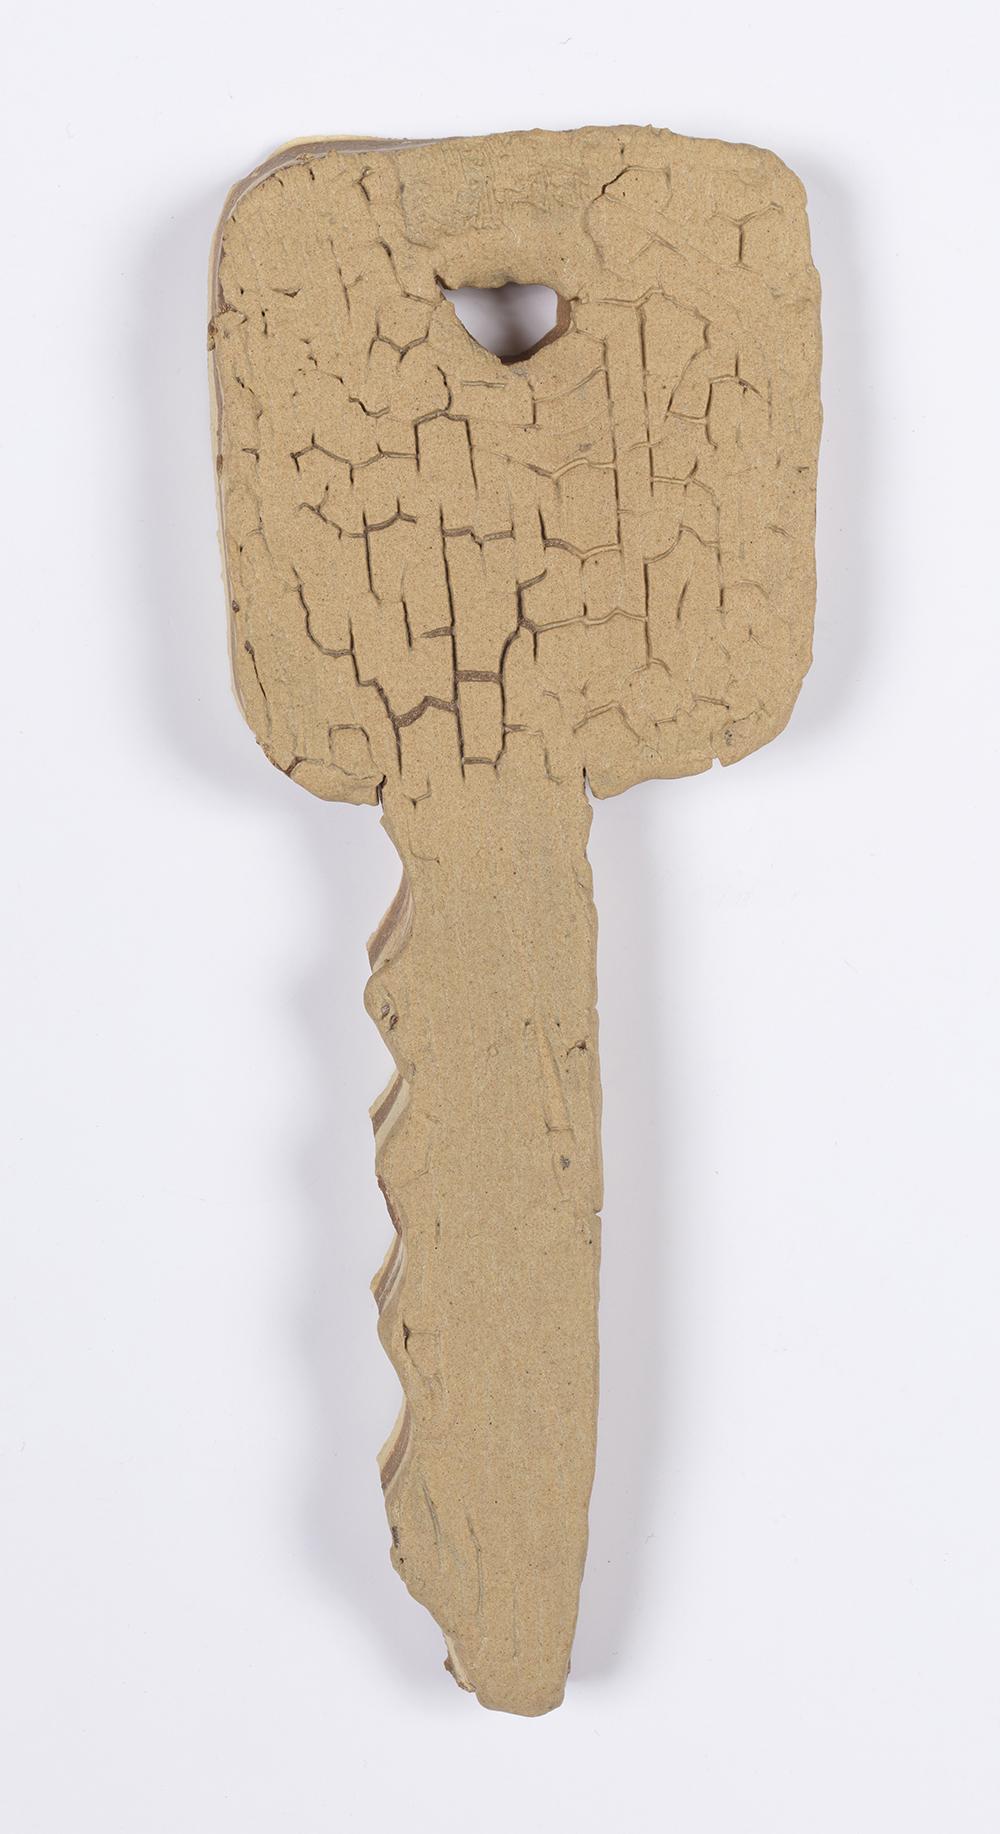 Kevin McNamee-Tweed.<em> Key (Chicharrone)</em>, 2019. Glazed ceramic, 5 3/4 x 2 1/4 inches (14.6 x 5.7 cm)